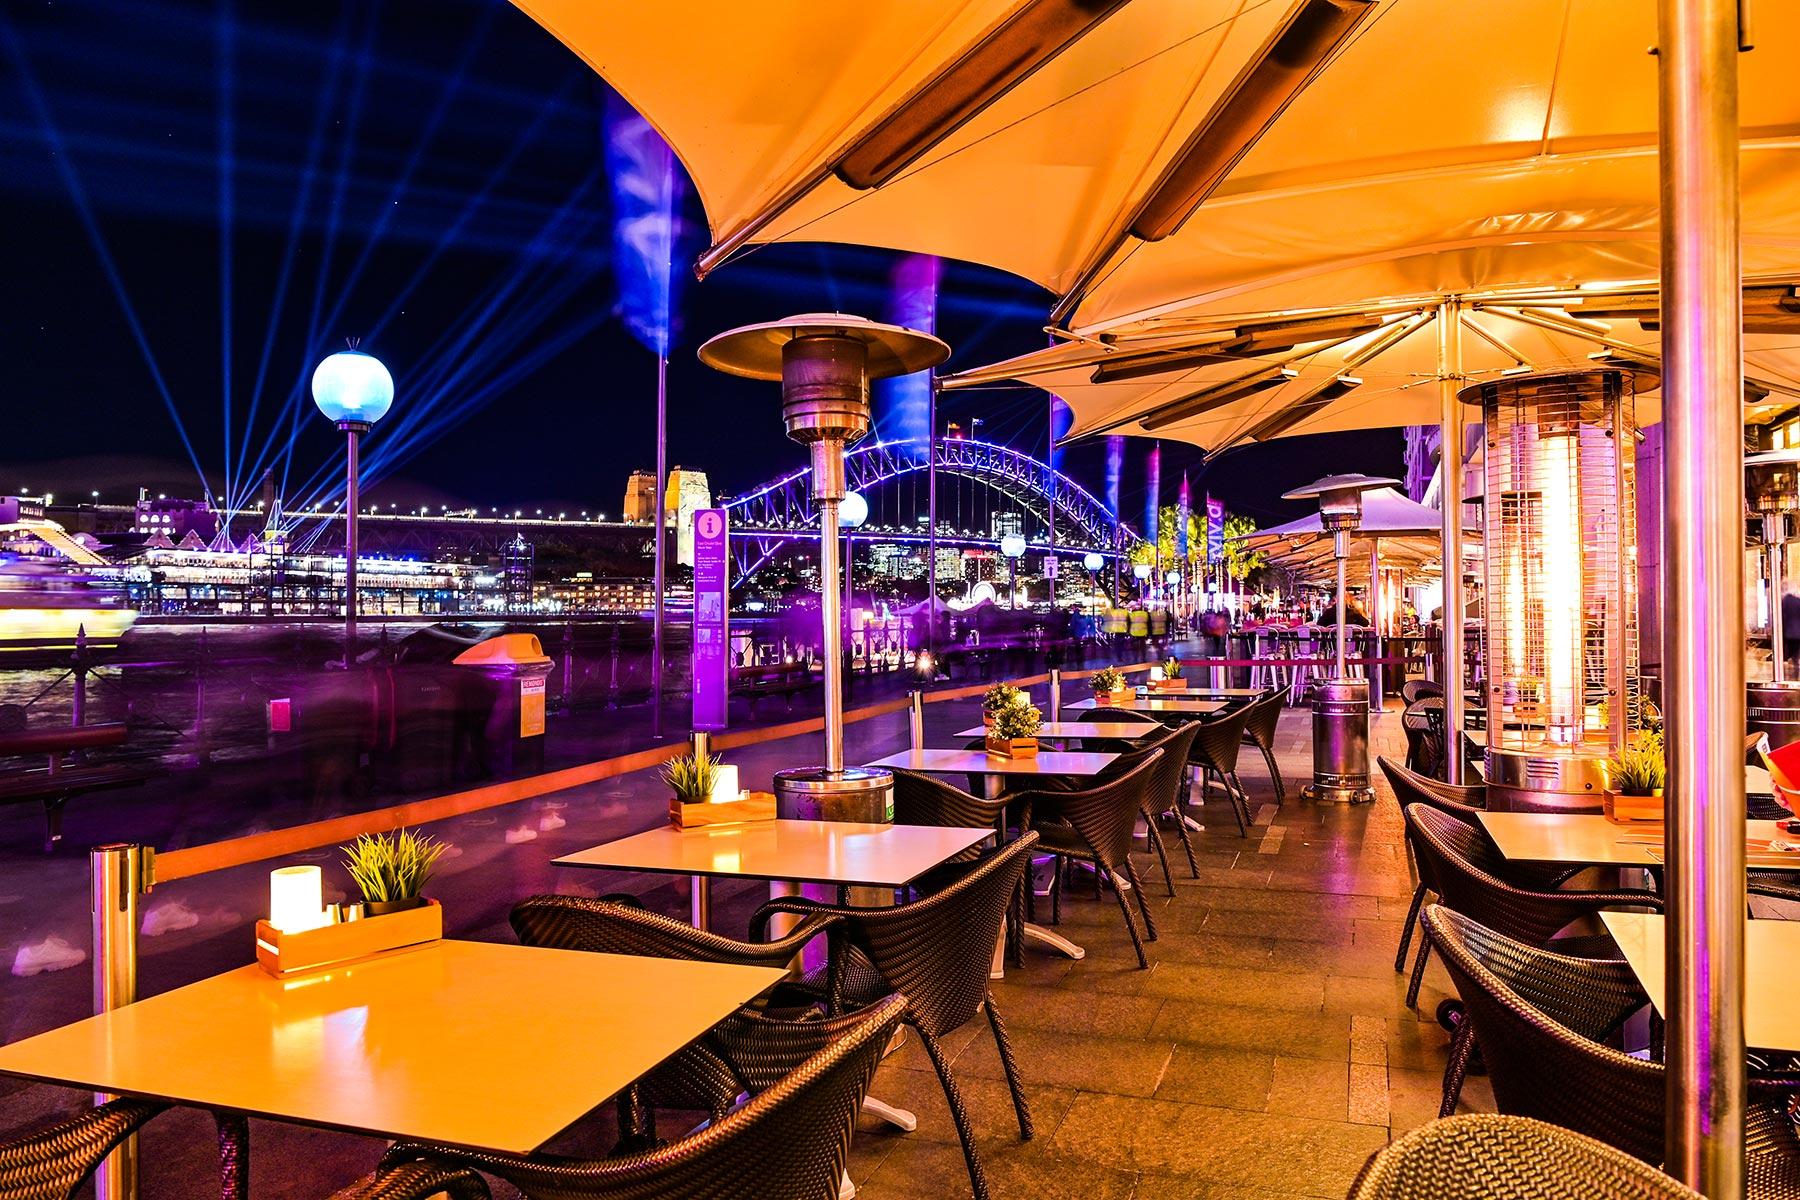 Eastbank Cafe Restaurant – nighttime on Circular Quay promenade, Vivid Festival